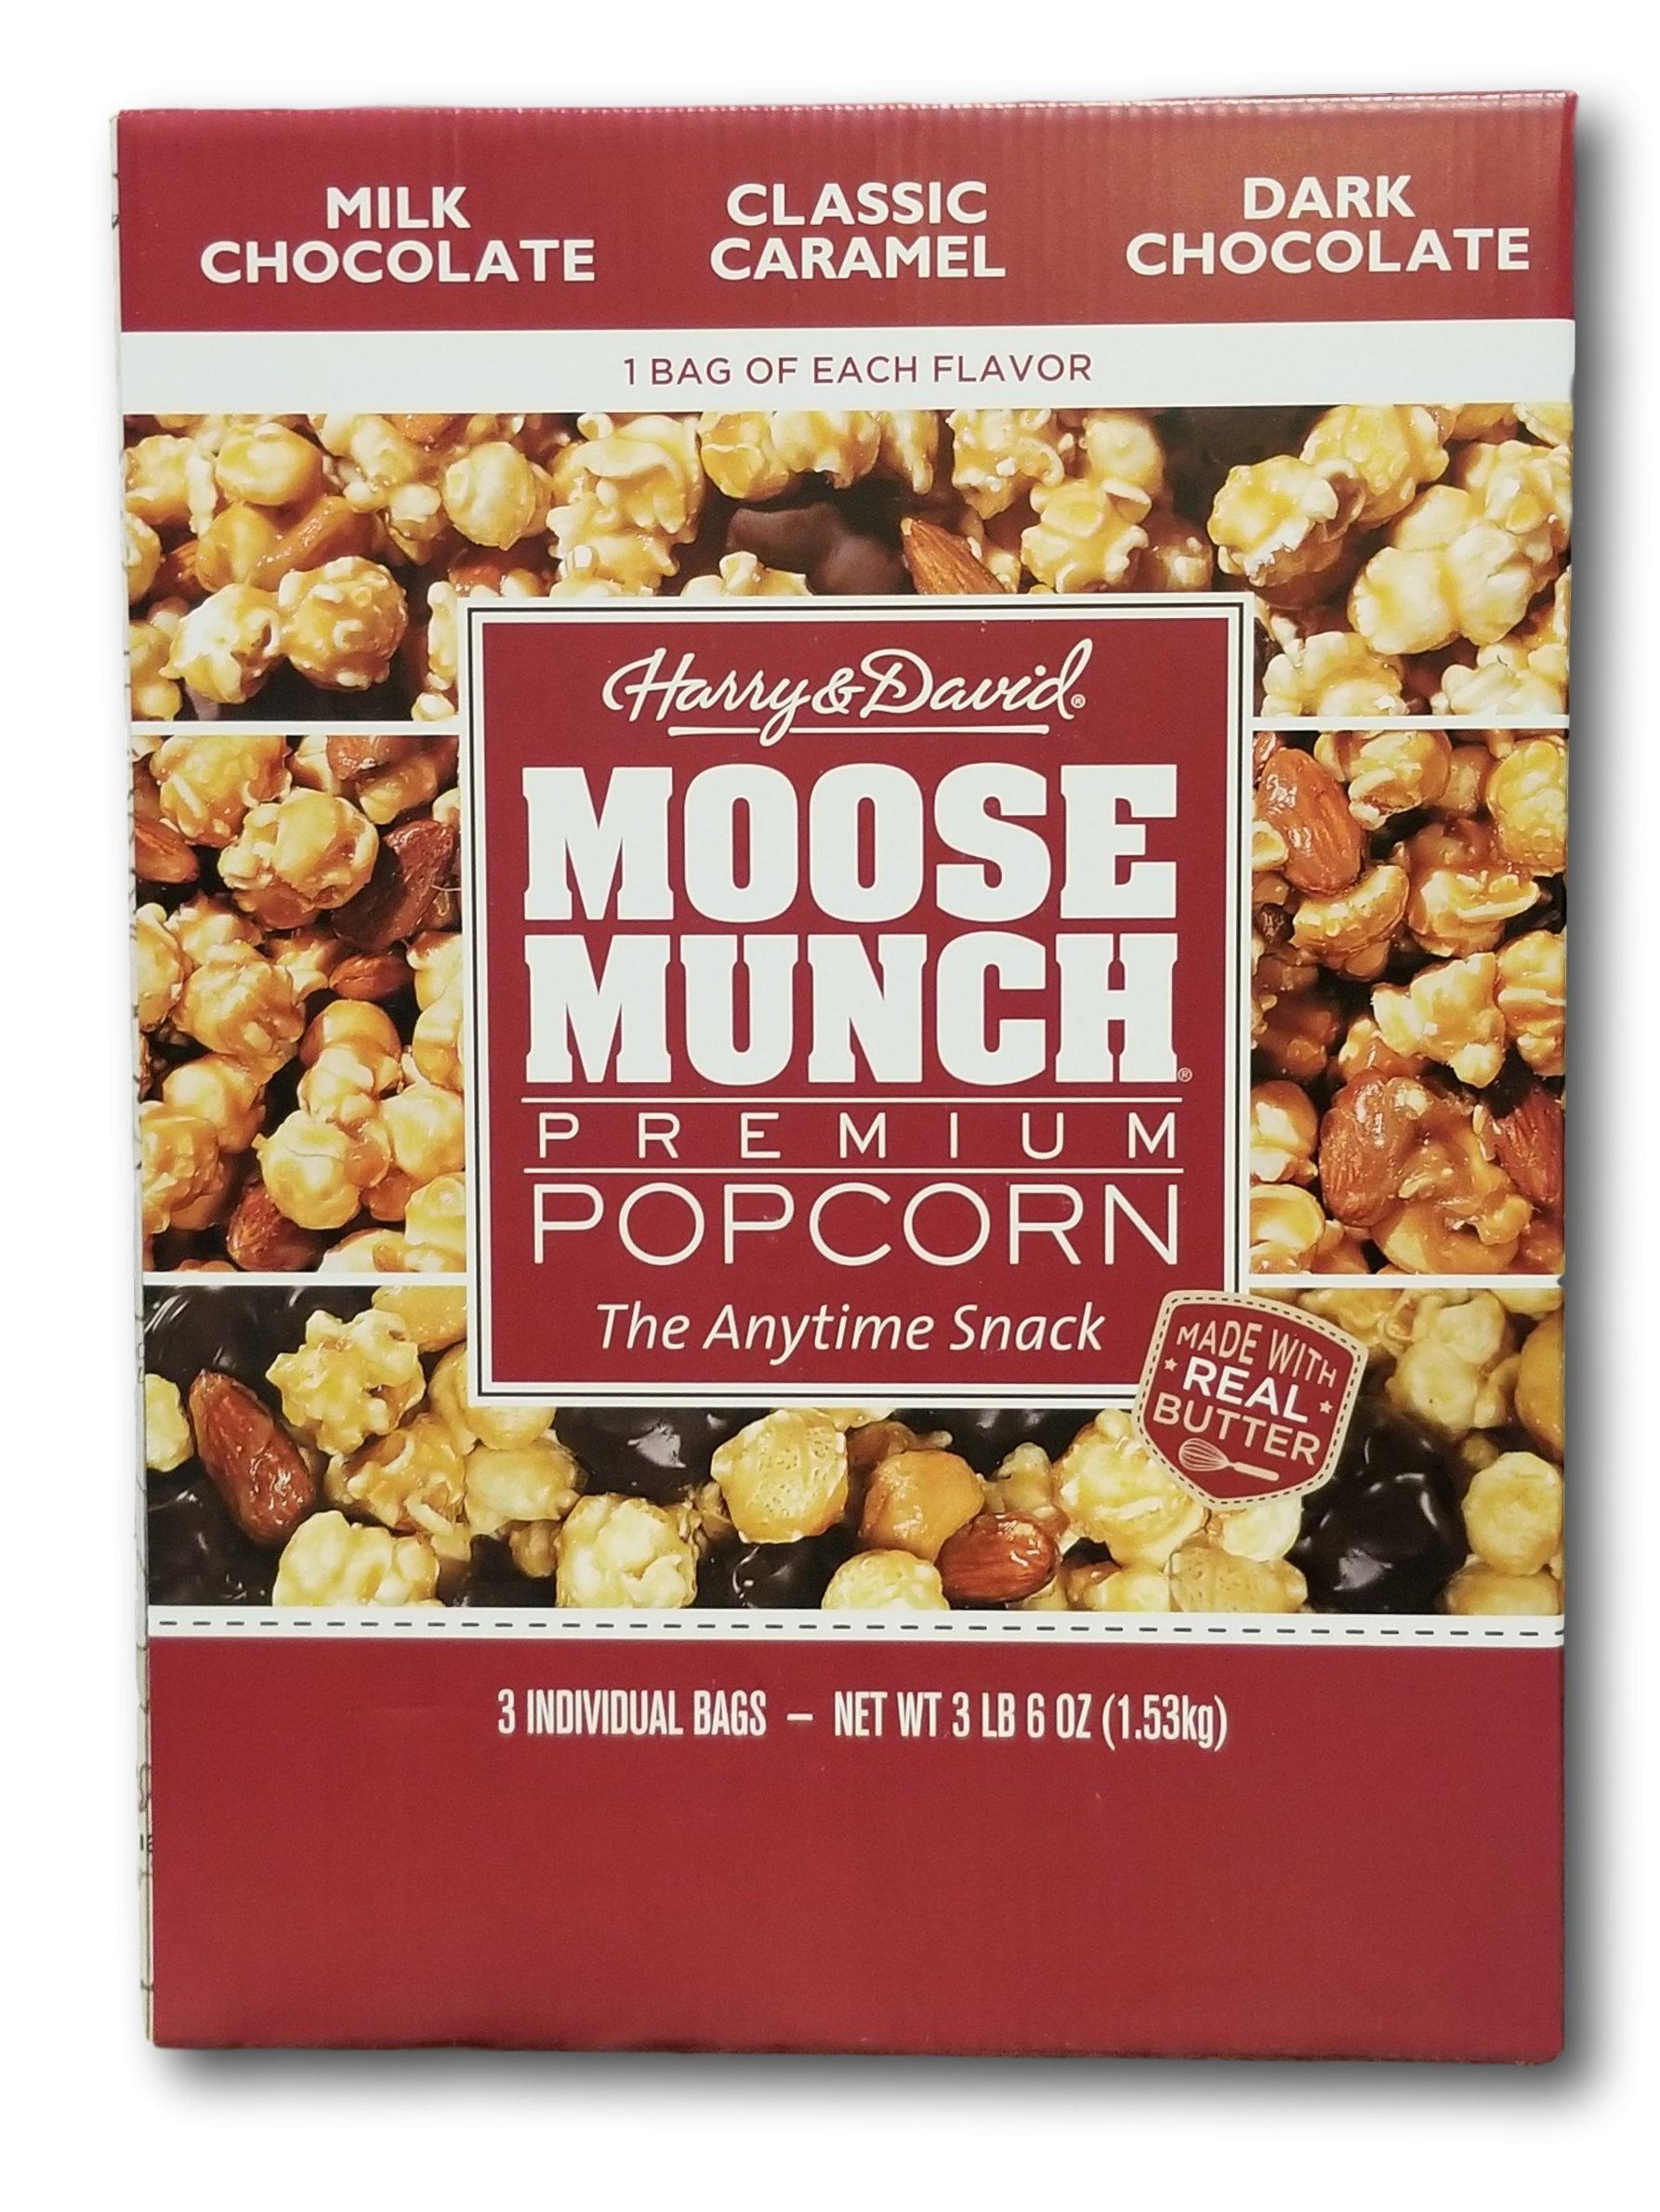 Moose Munch Premium Popcorn 3 Individual Flavor Bags- Milk Chocolate, Classic Caramel, Dark Chocolate